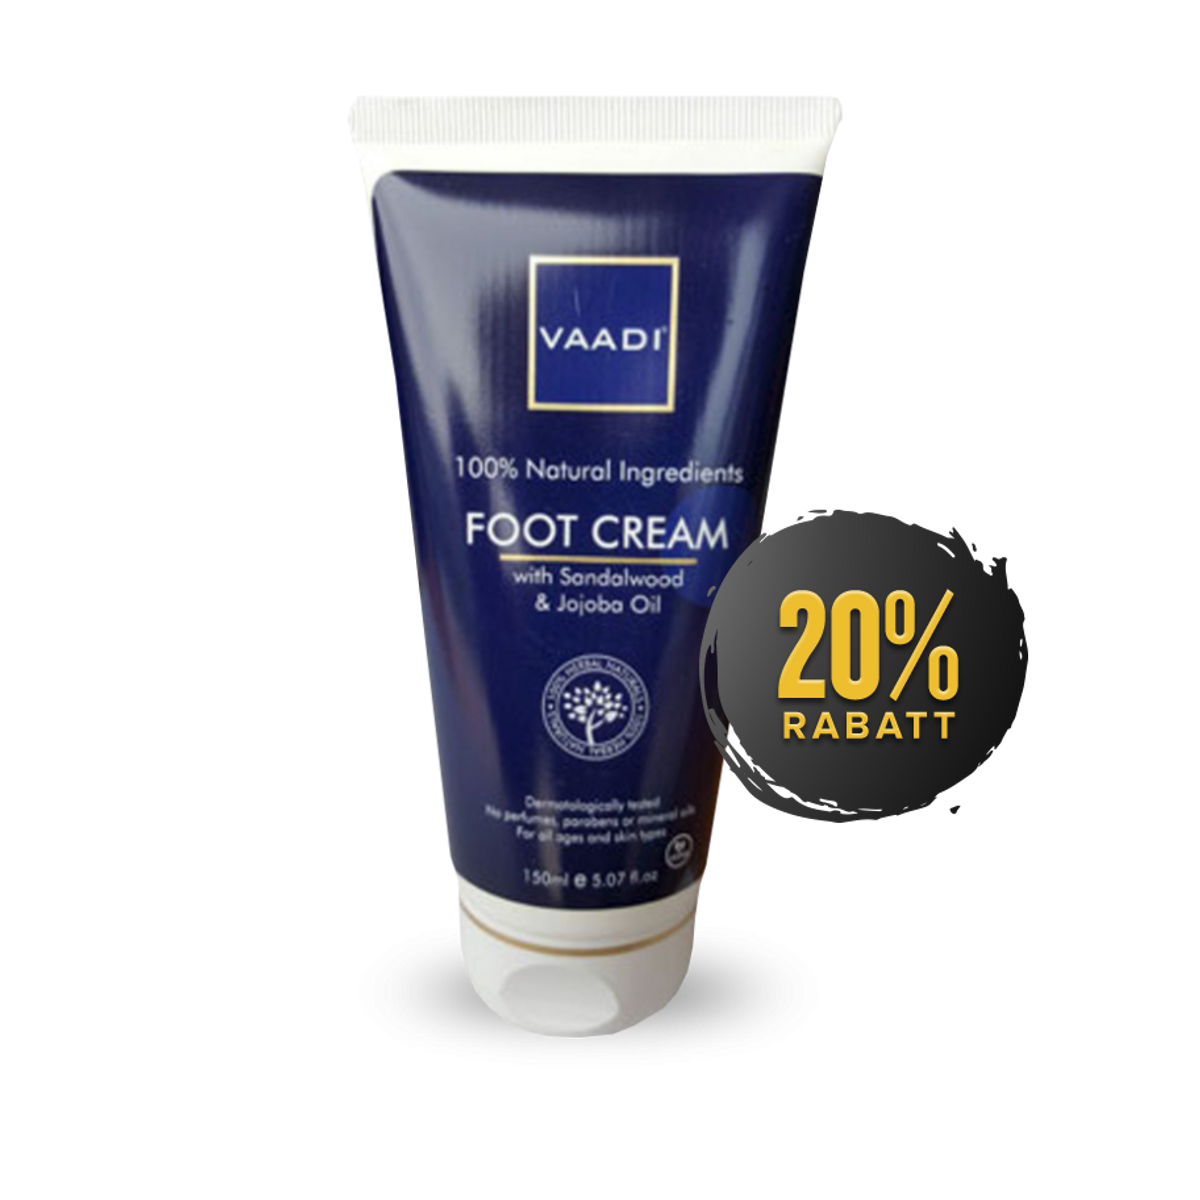 Foot Cream (Vaadi)